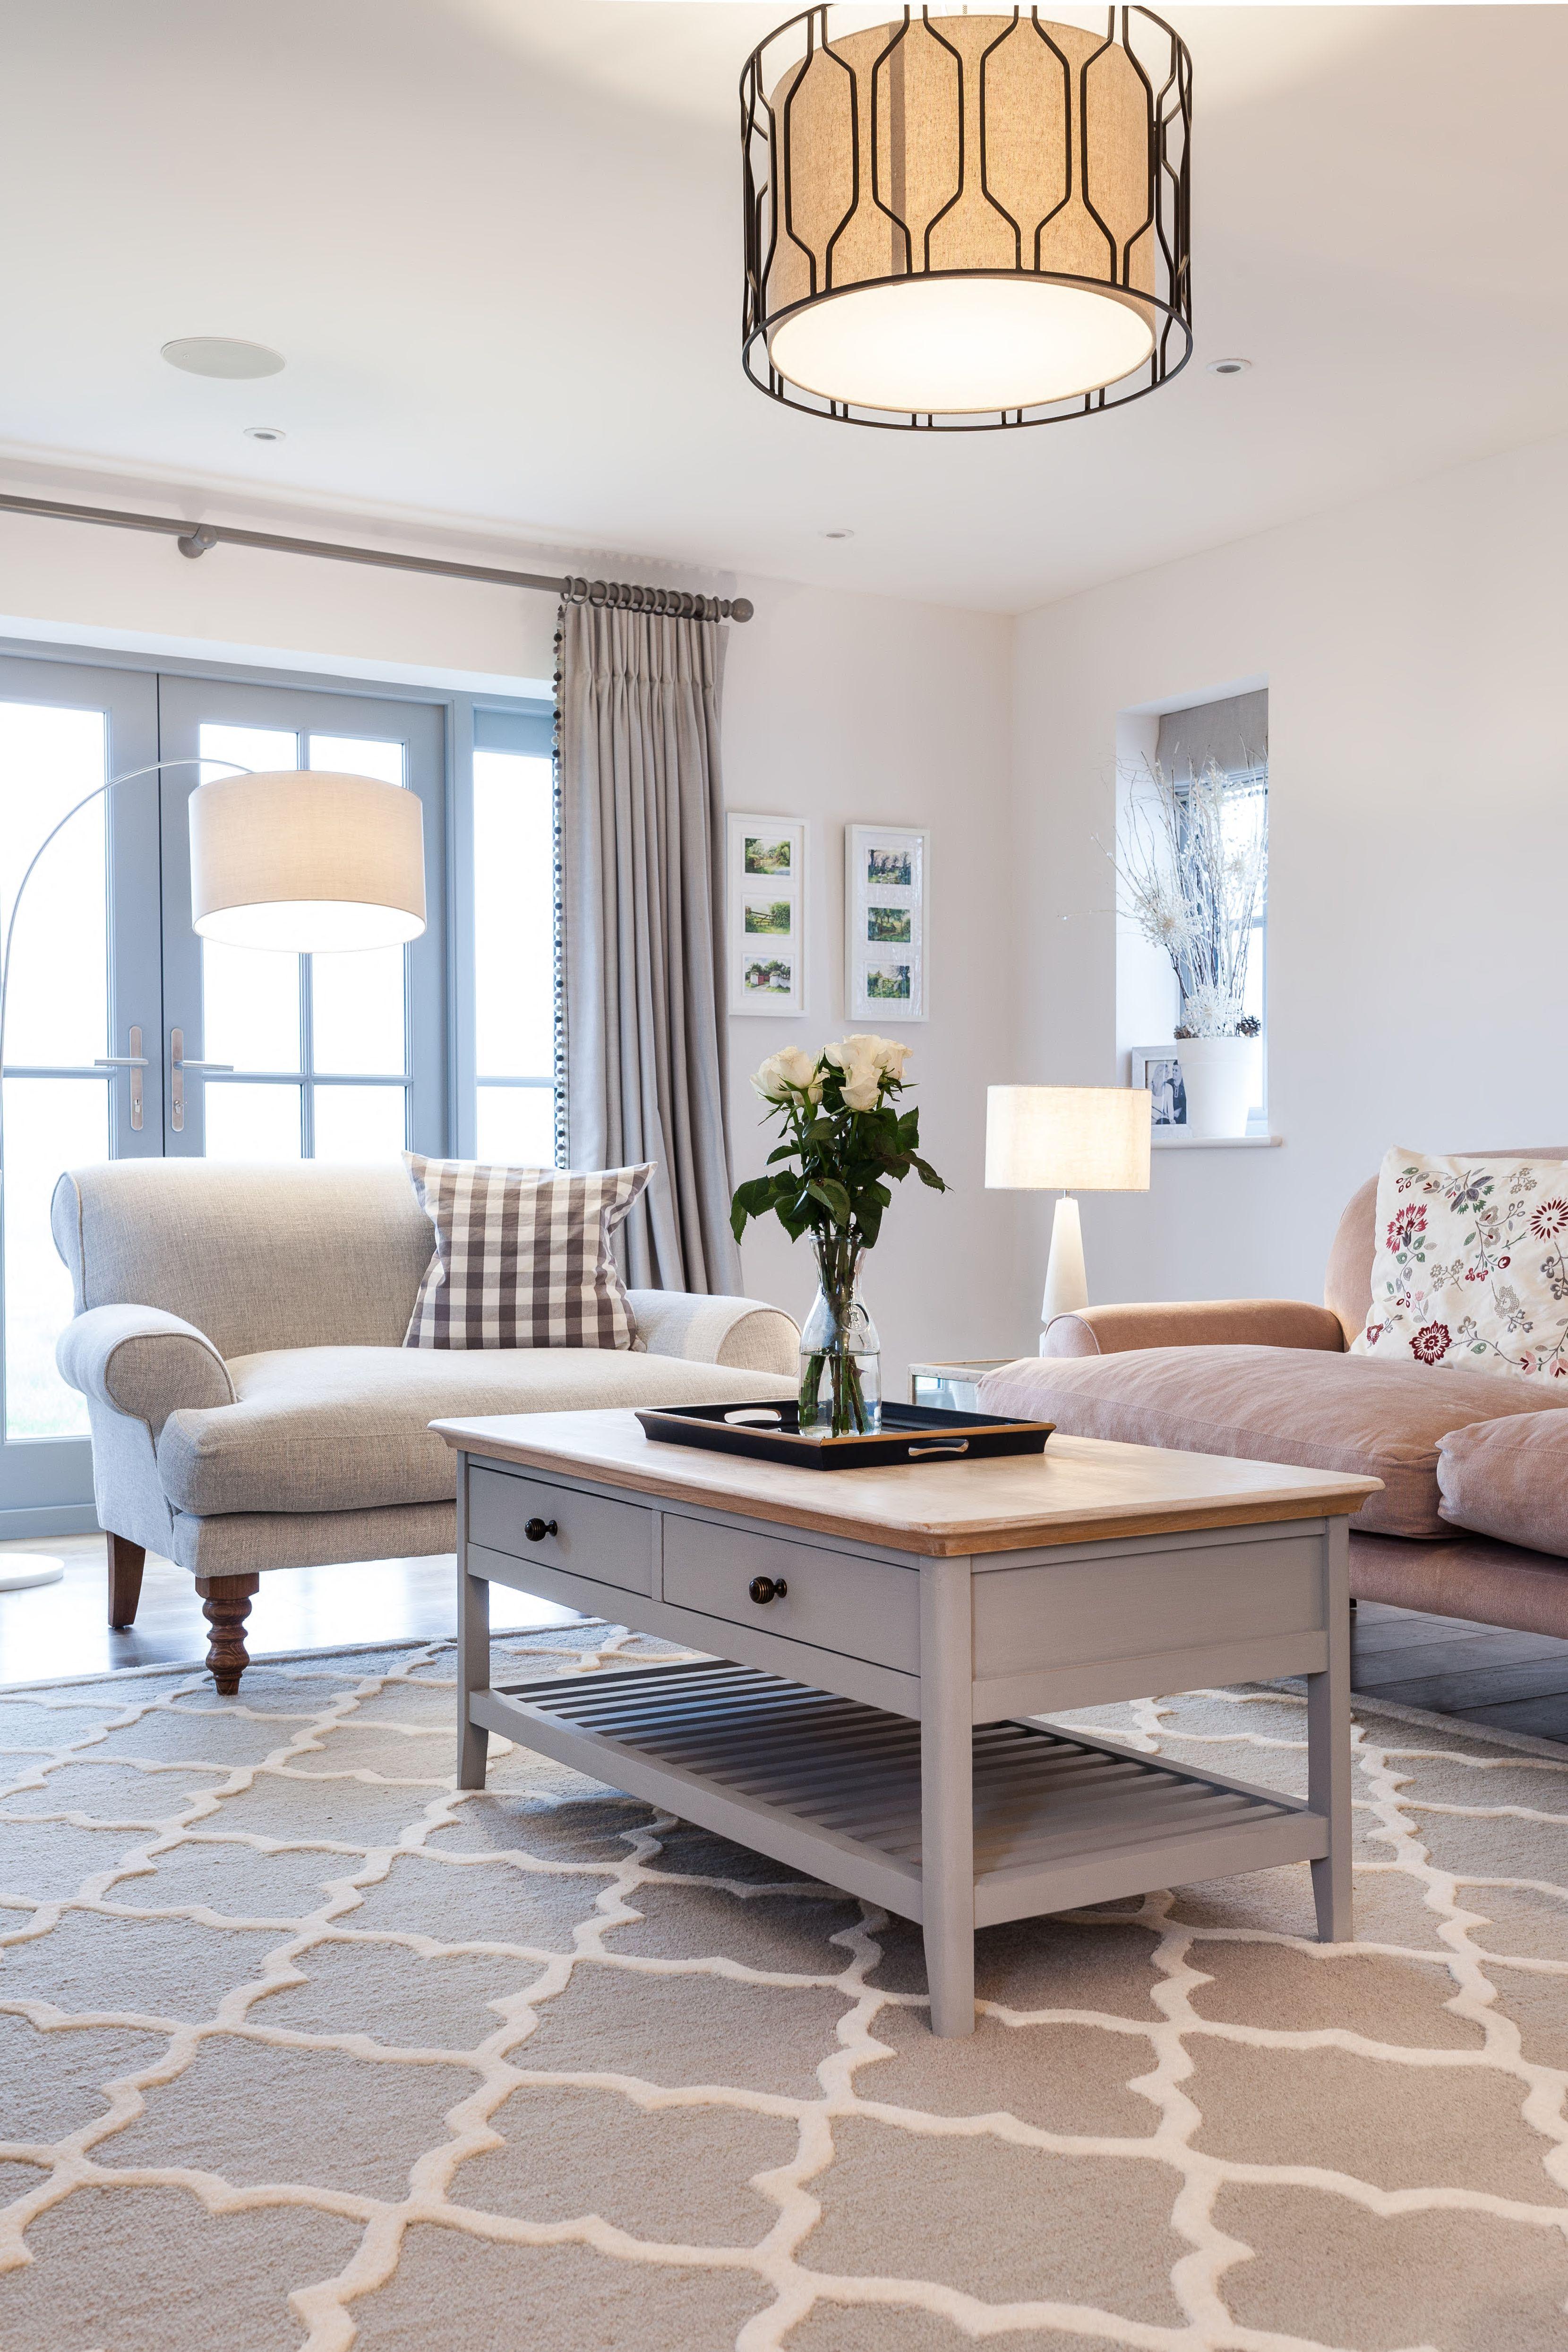 Living room interior design home decor inspiration pastel sofa coffee table interiors